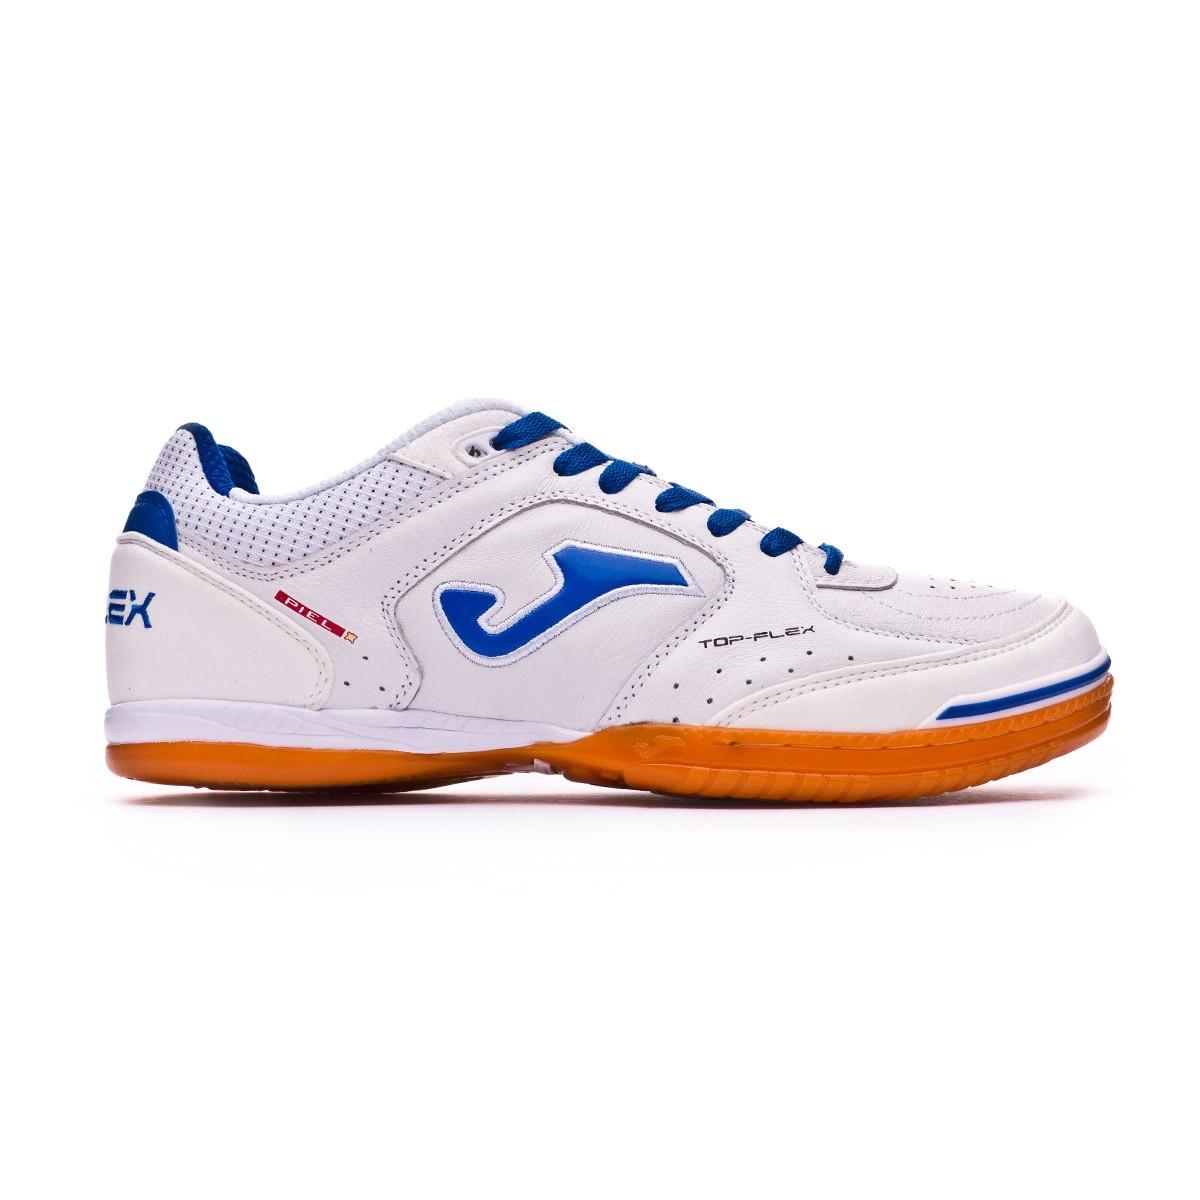 a0e0b0ef781 Futsal Boot Joma Top Flex White-blue - Tienda de fútbol Fútbol Emotion